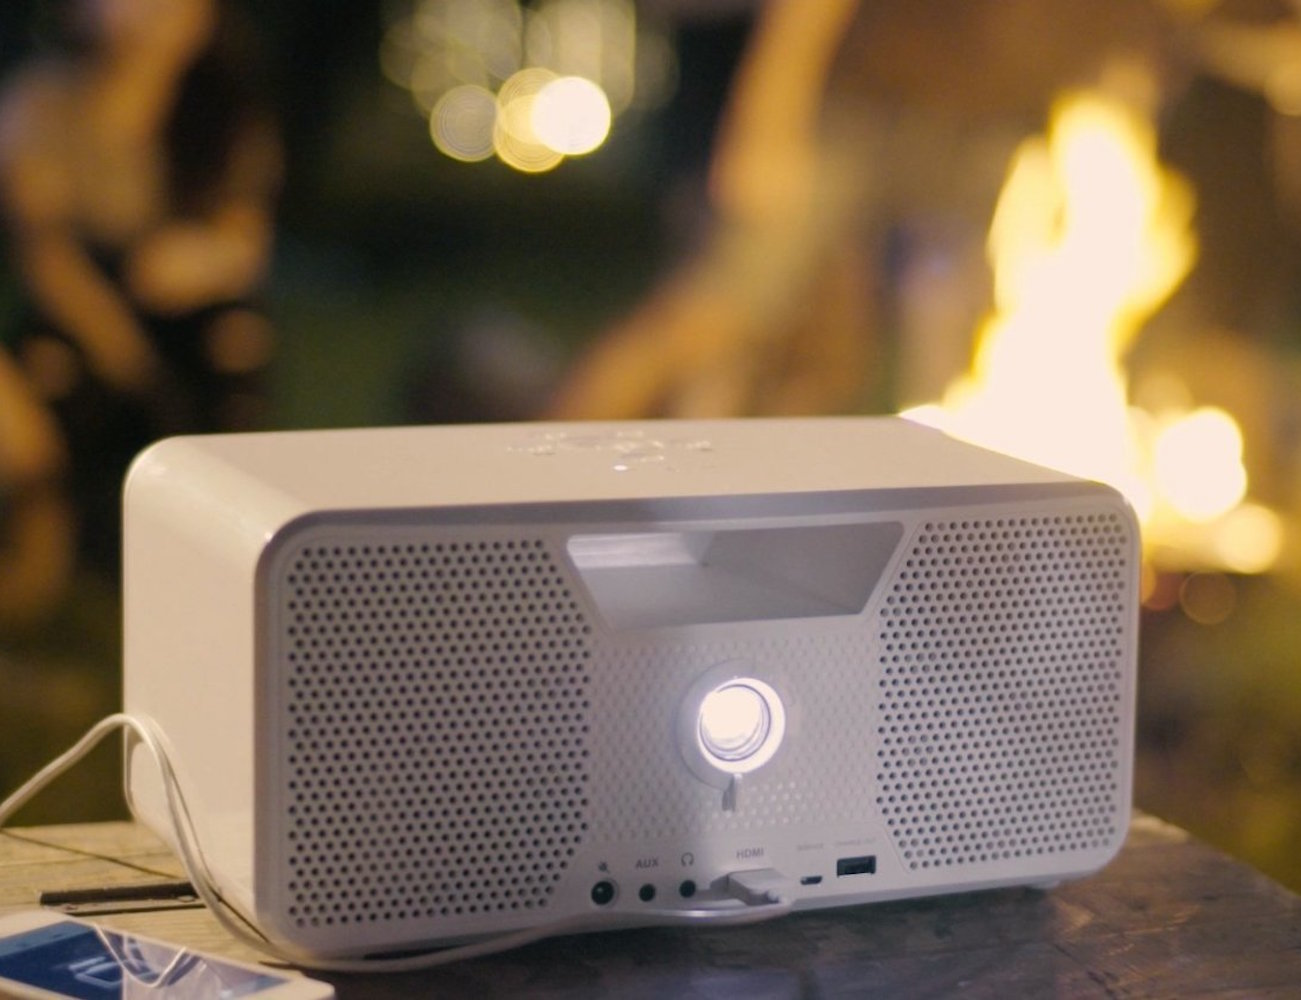 Dashbon Flicks Mobile Cordless Boombox Projector